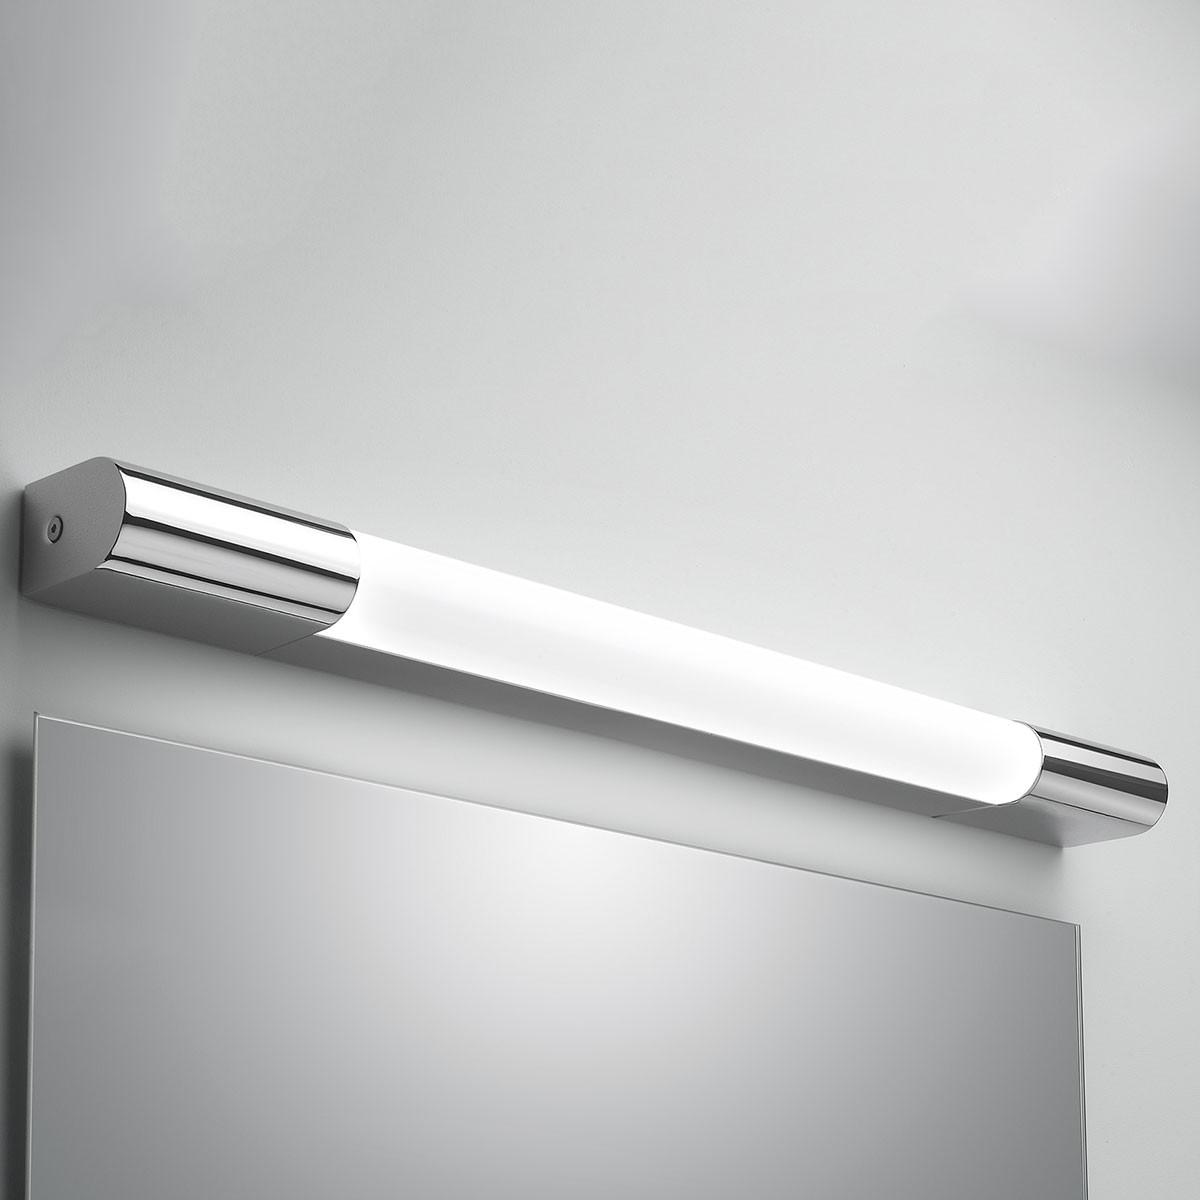 Astro palermo 600 polished chrome bathroom wall light with pull cord astro palermo 600 polished chrome bathroom wall light with pull cord mozeypictures Gallery